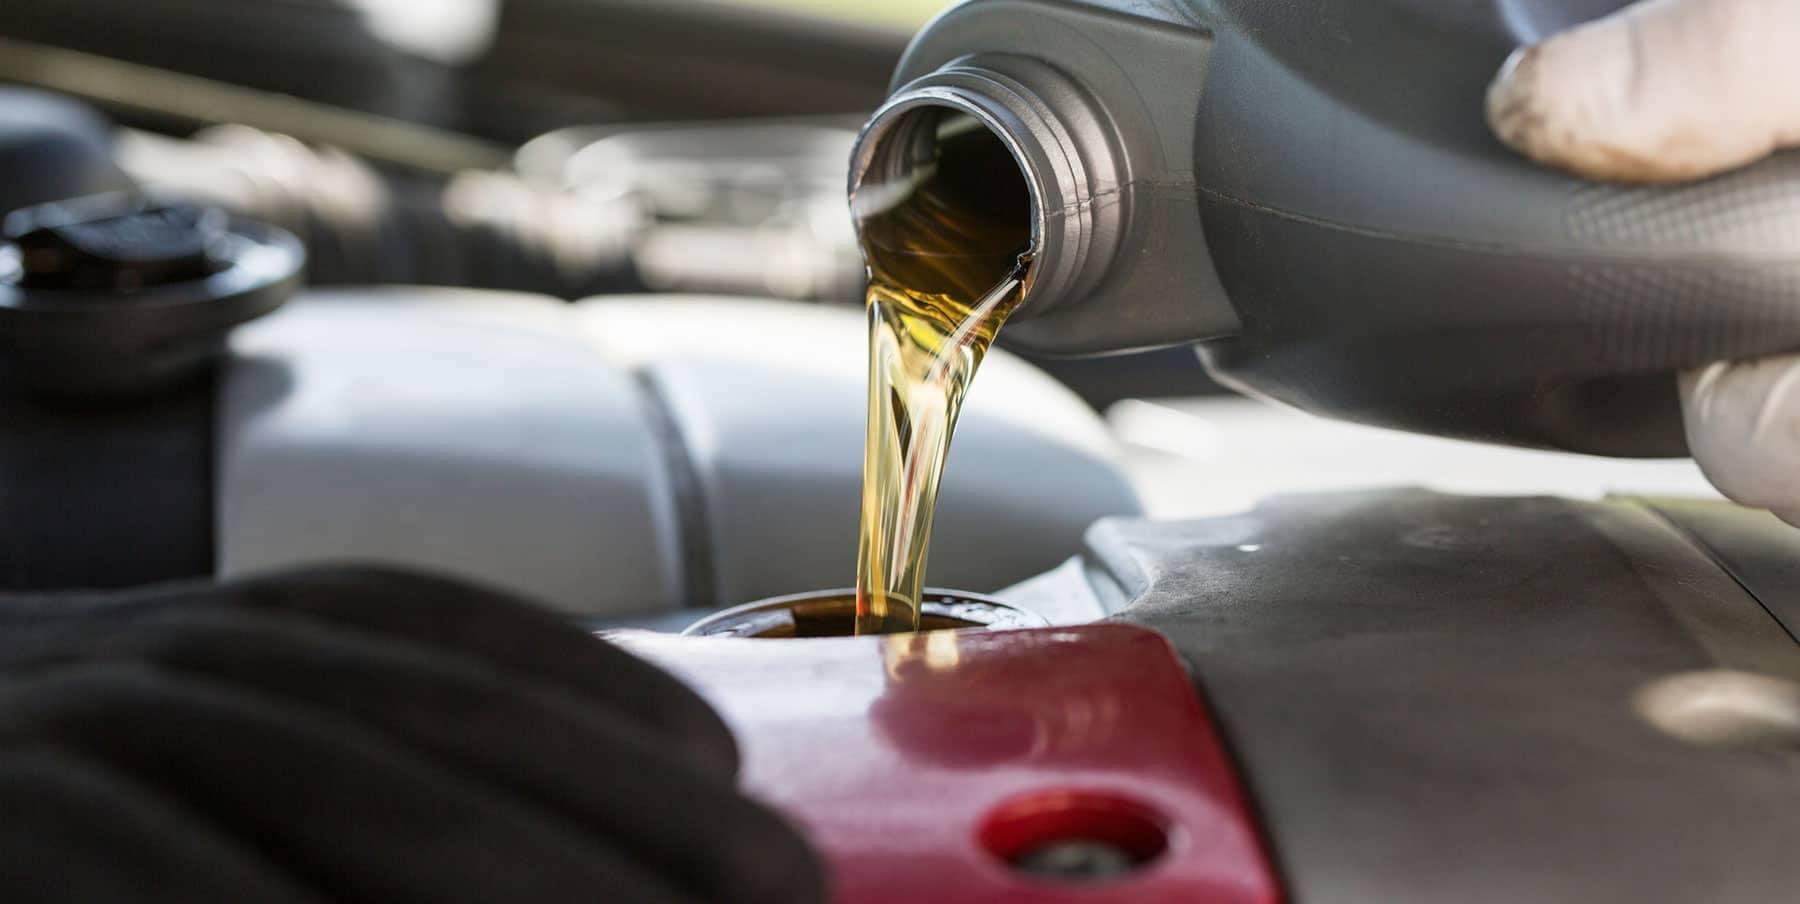 Service Oil Change